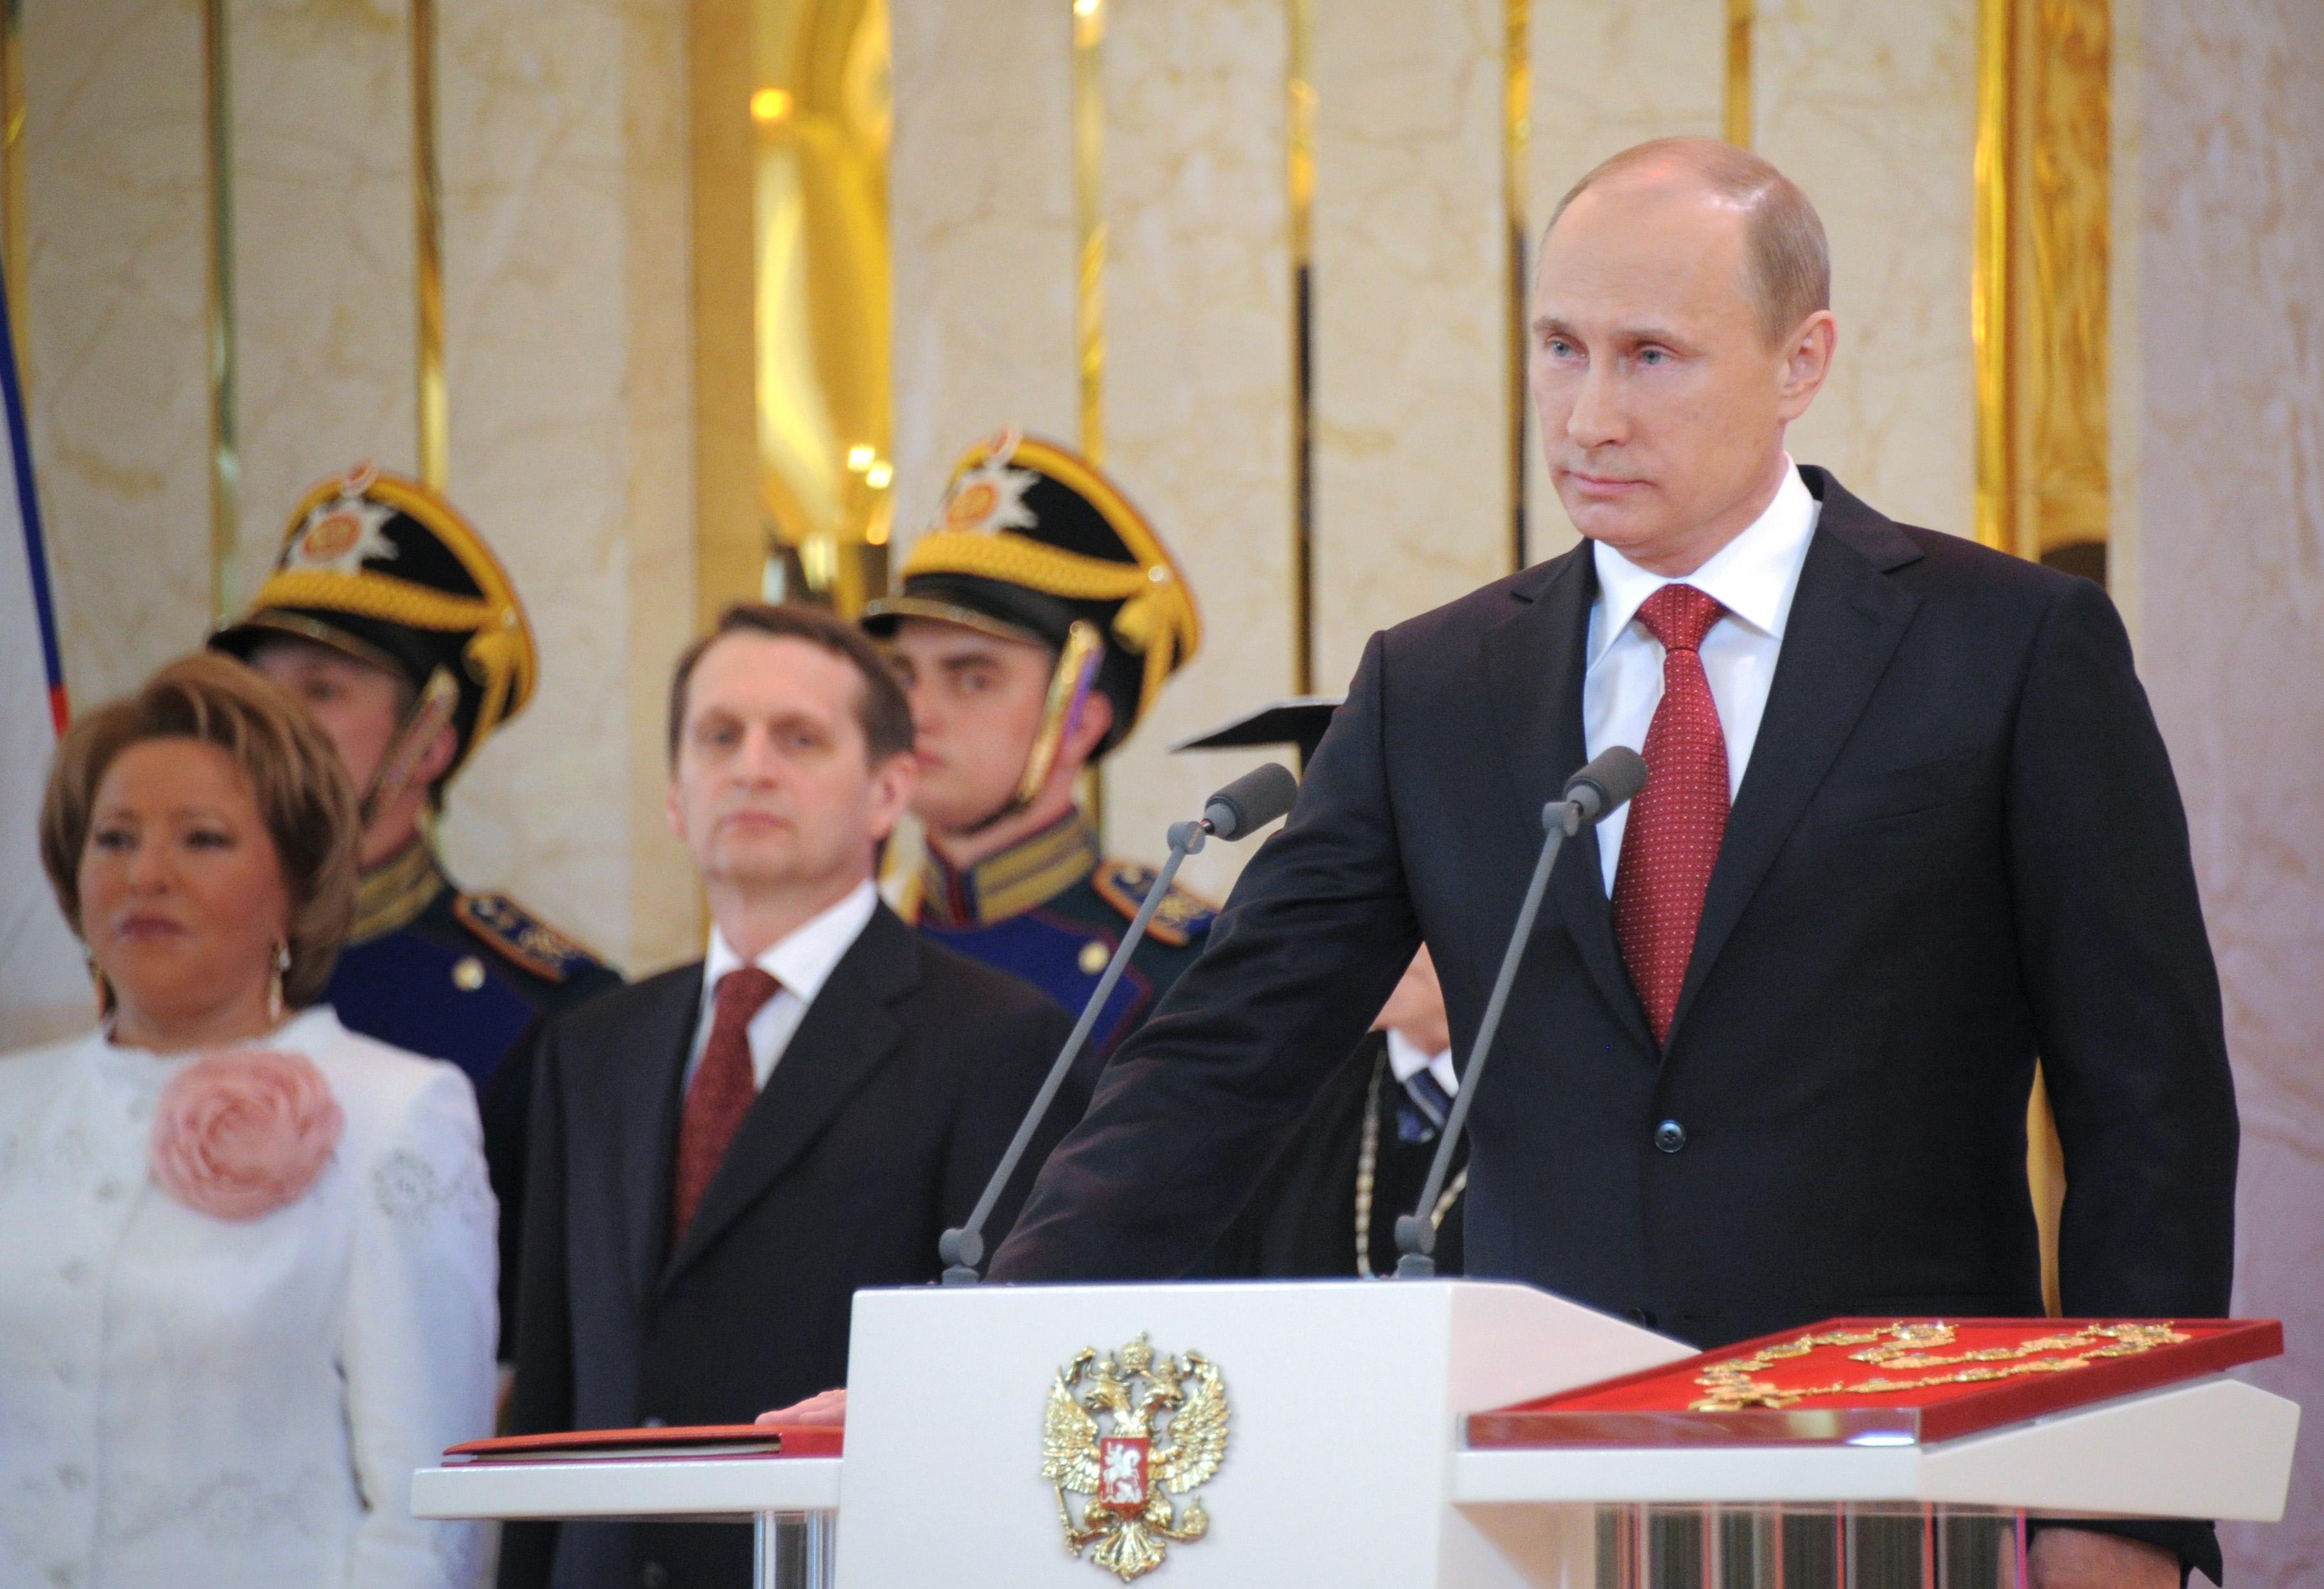 http://upload.wikimedia.org/wikipedia/commons/2/25/Vladimir_Putin_inauguration_7_May_2012-10.jpeg